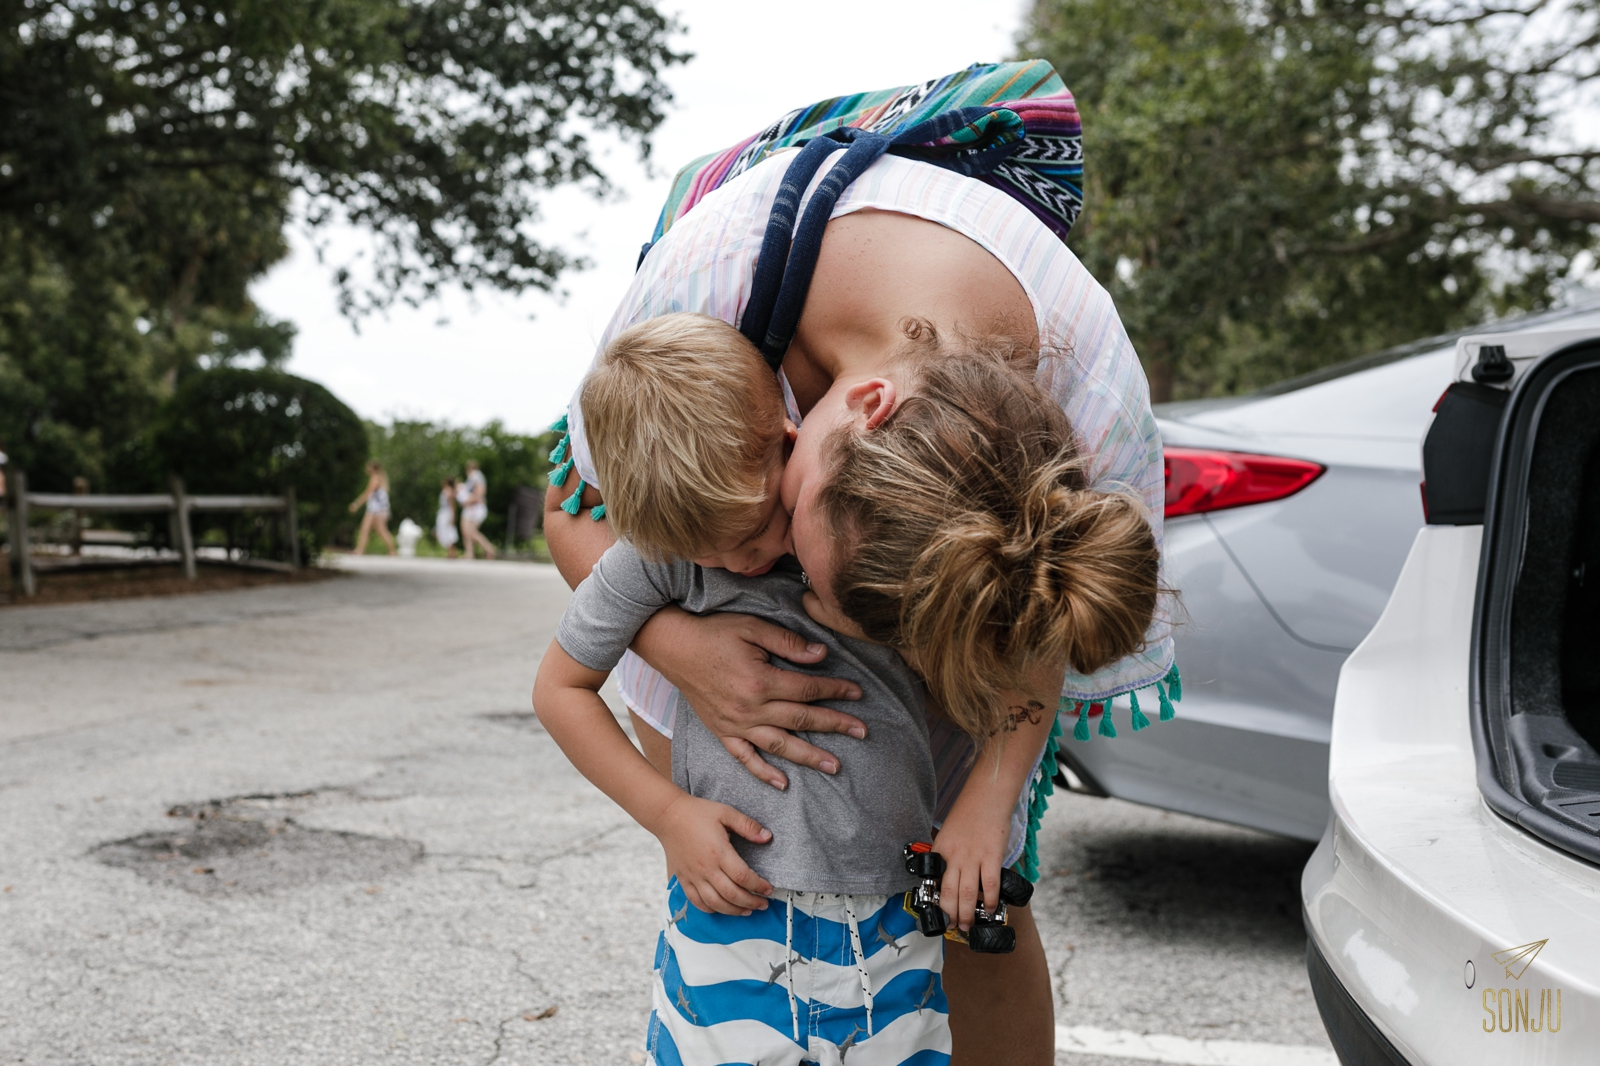 Florida-family-photography-documentary-DITL-Jupiter-Sonju00010.jpg